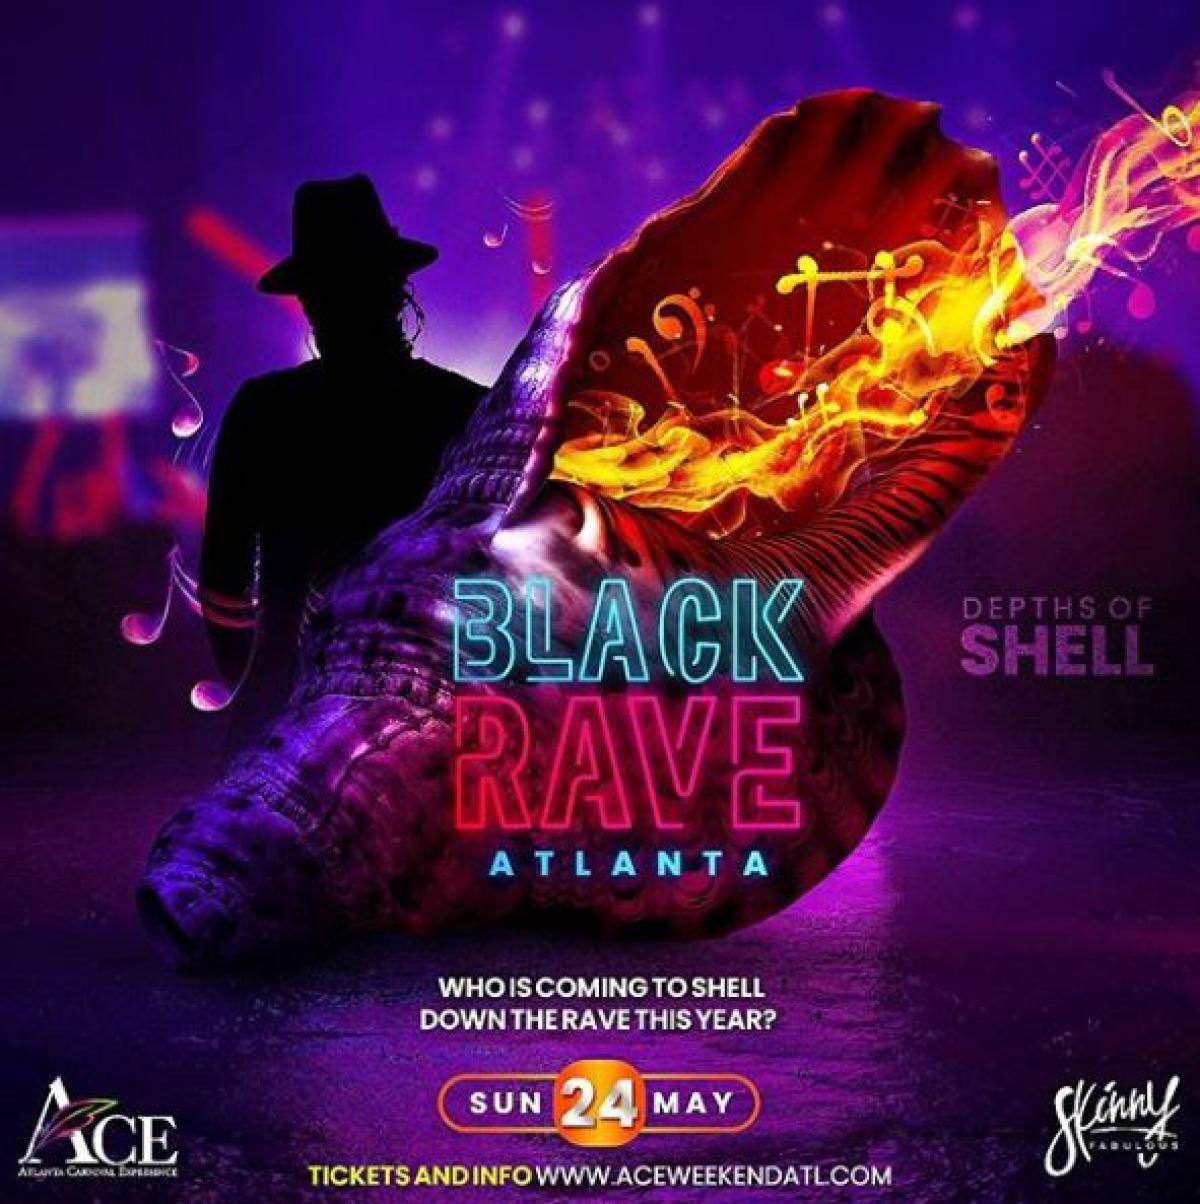 Black Rave ATL flyer or graphic.